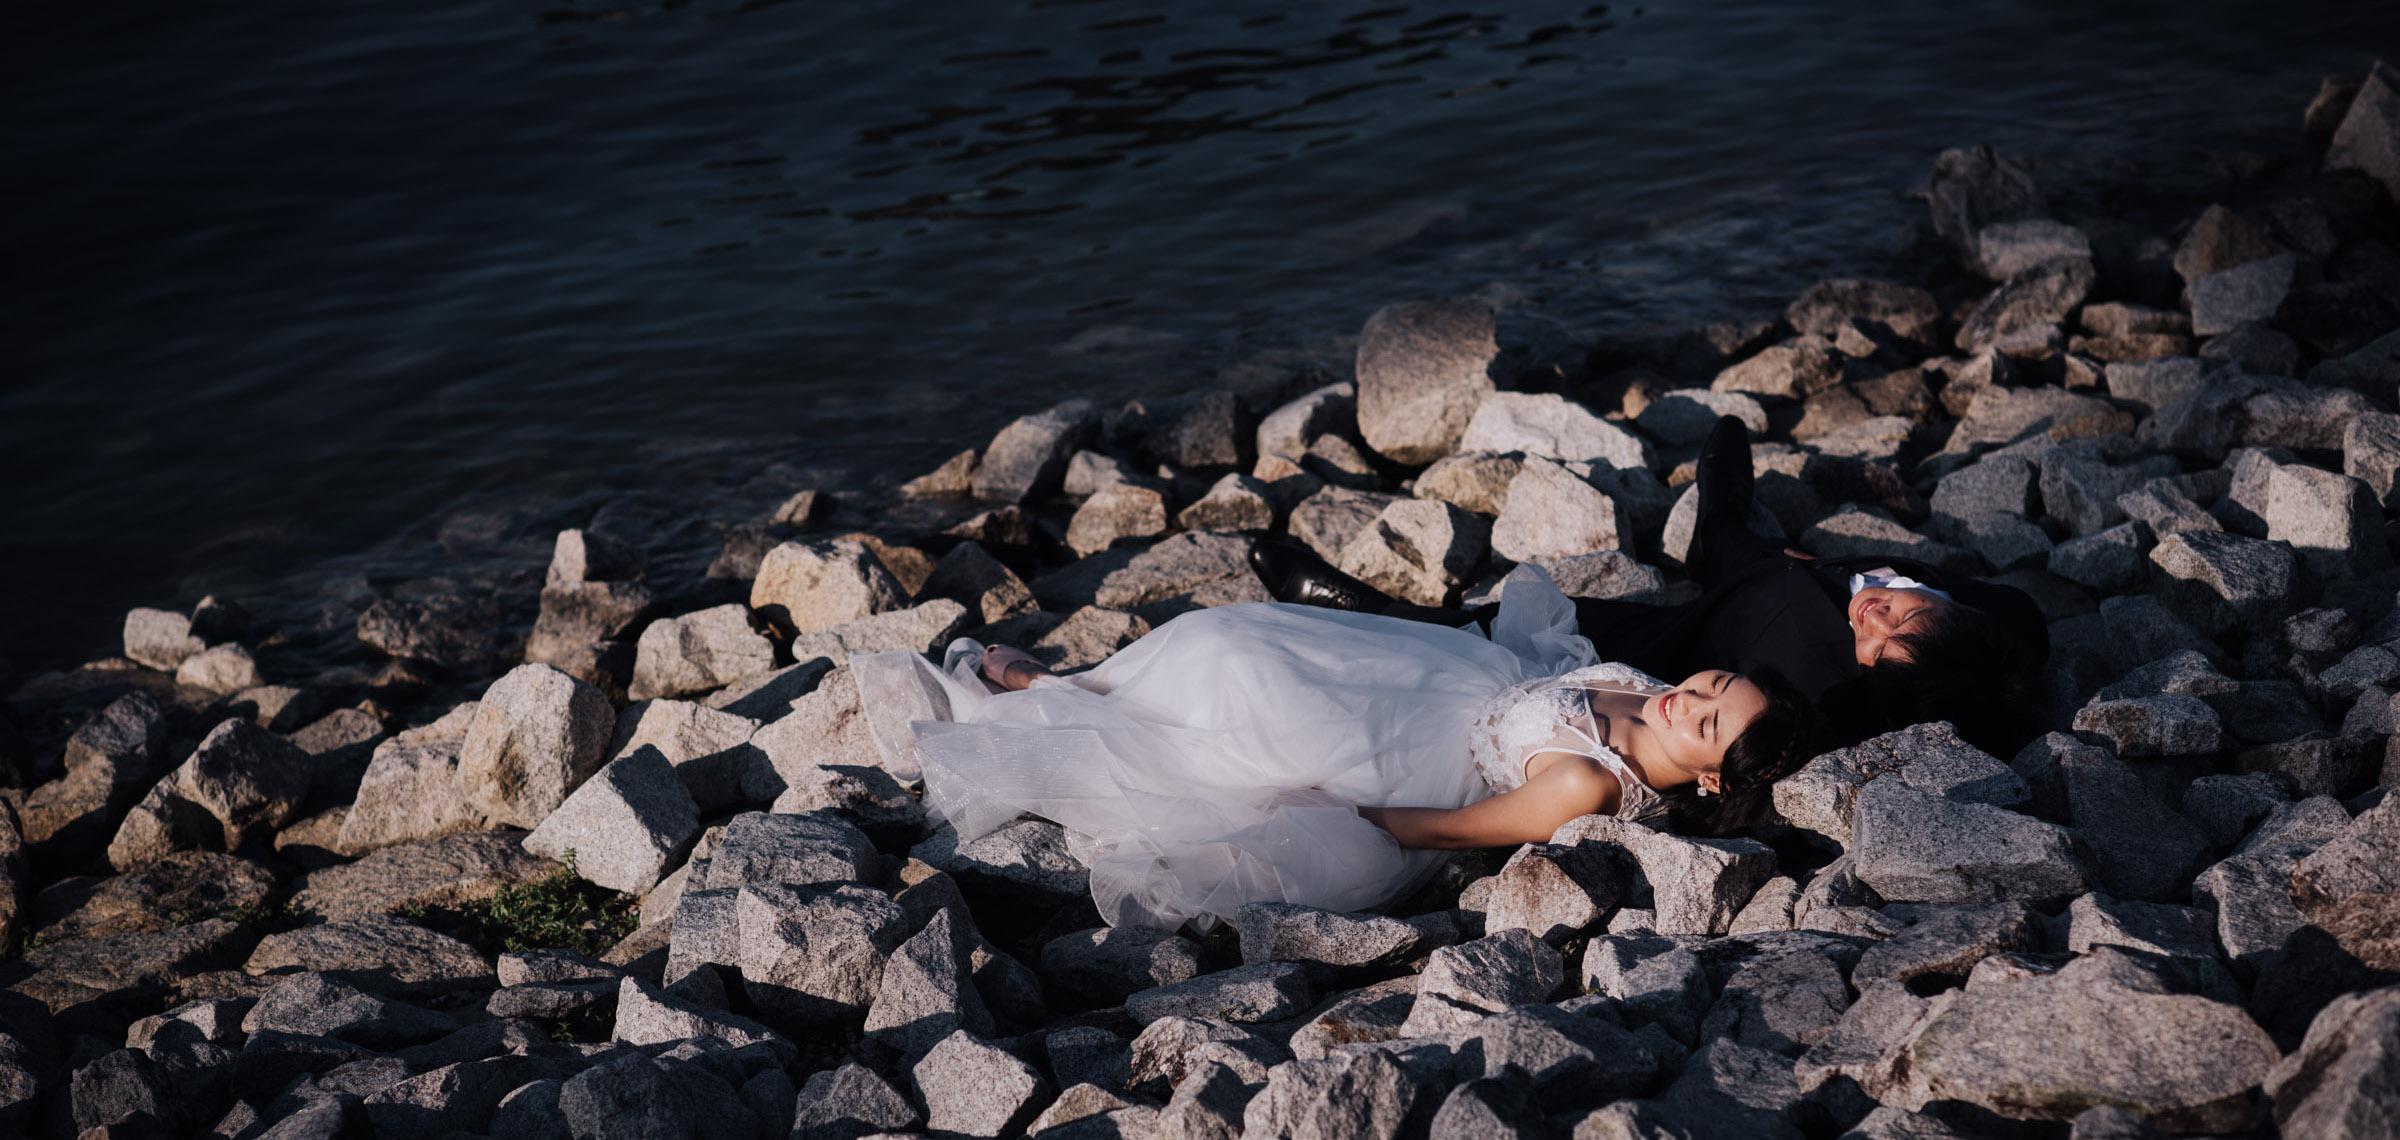 Lower peirce reservoir wedding shoot 12 copy